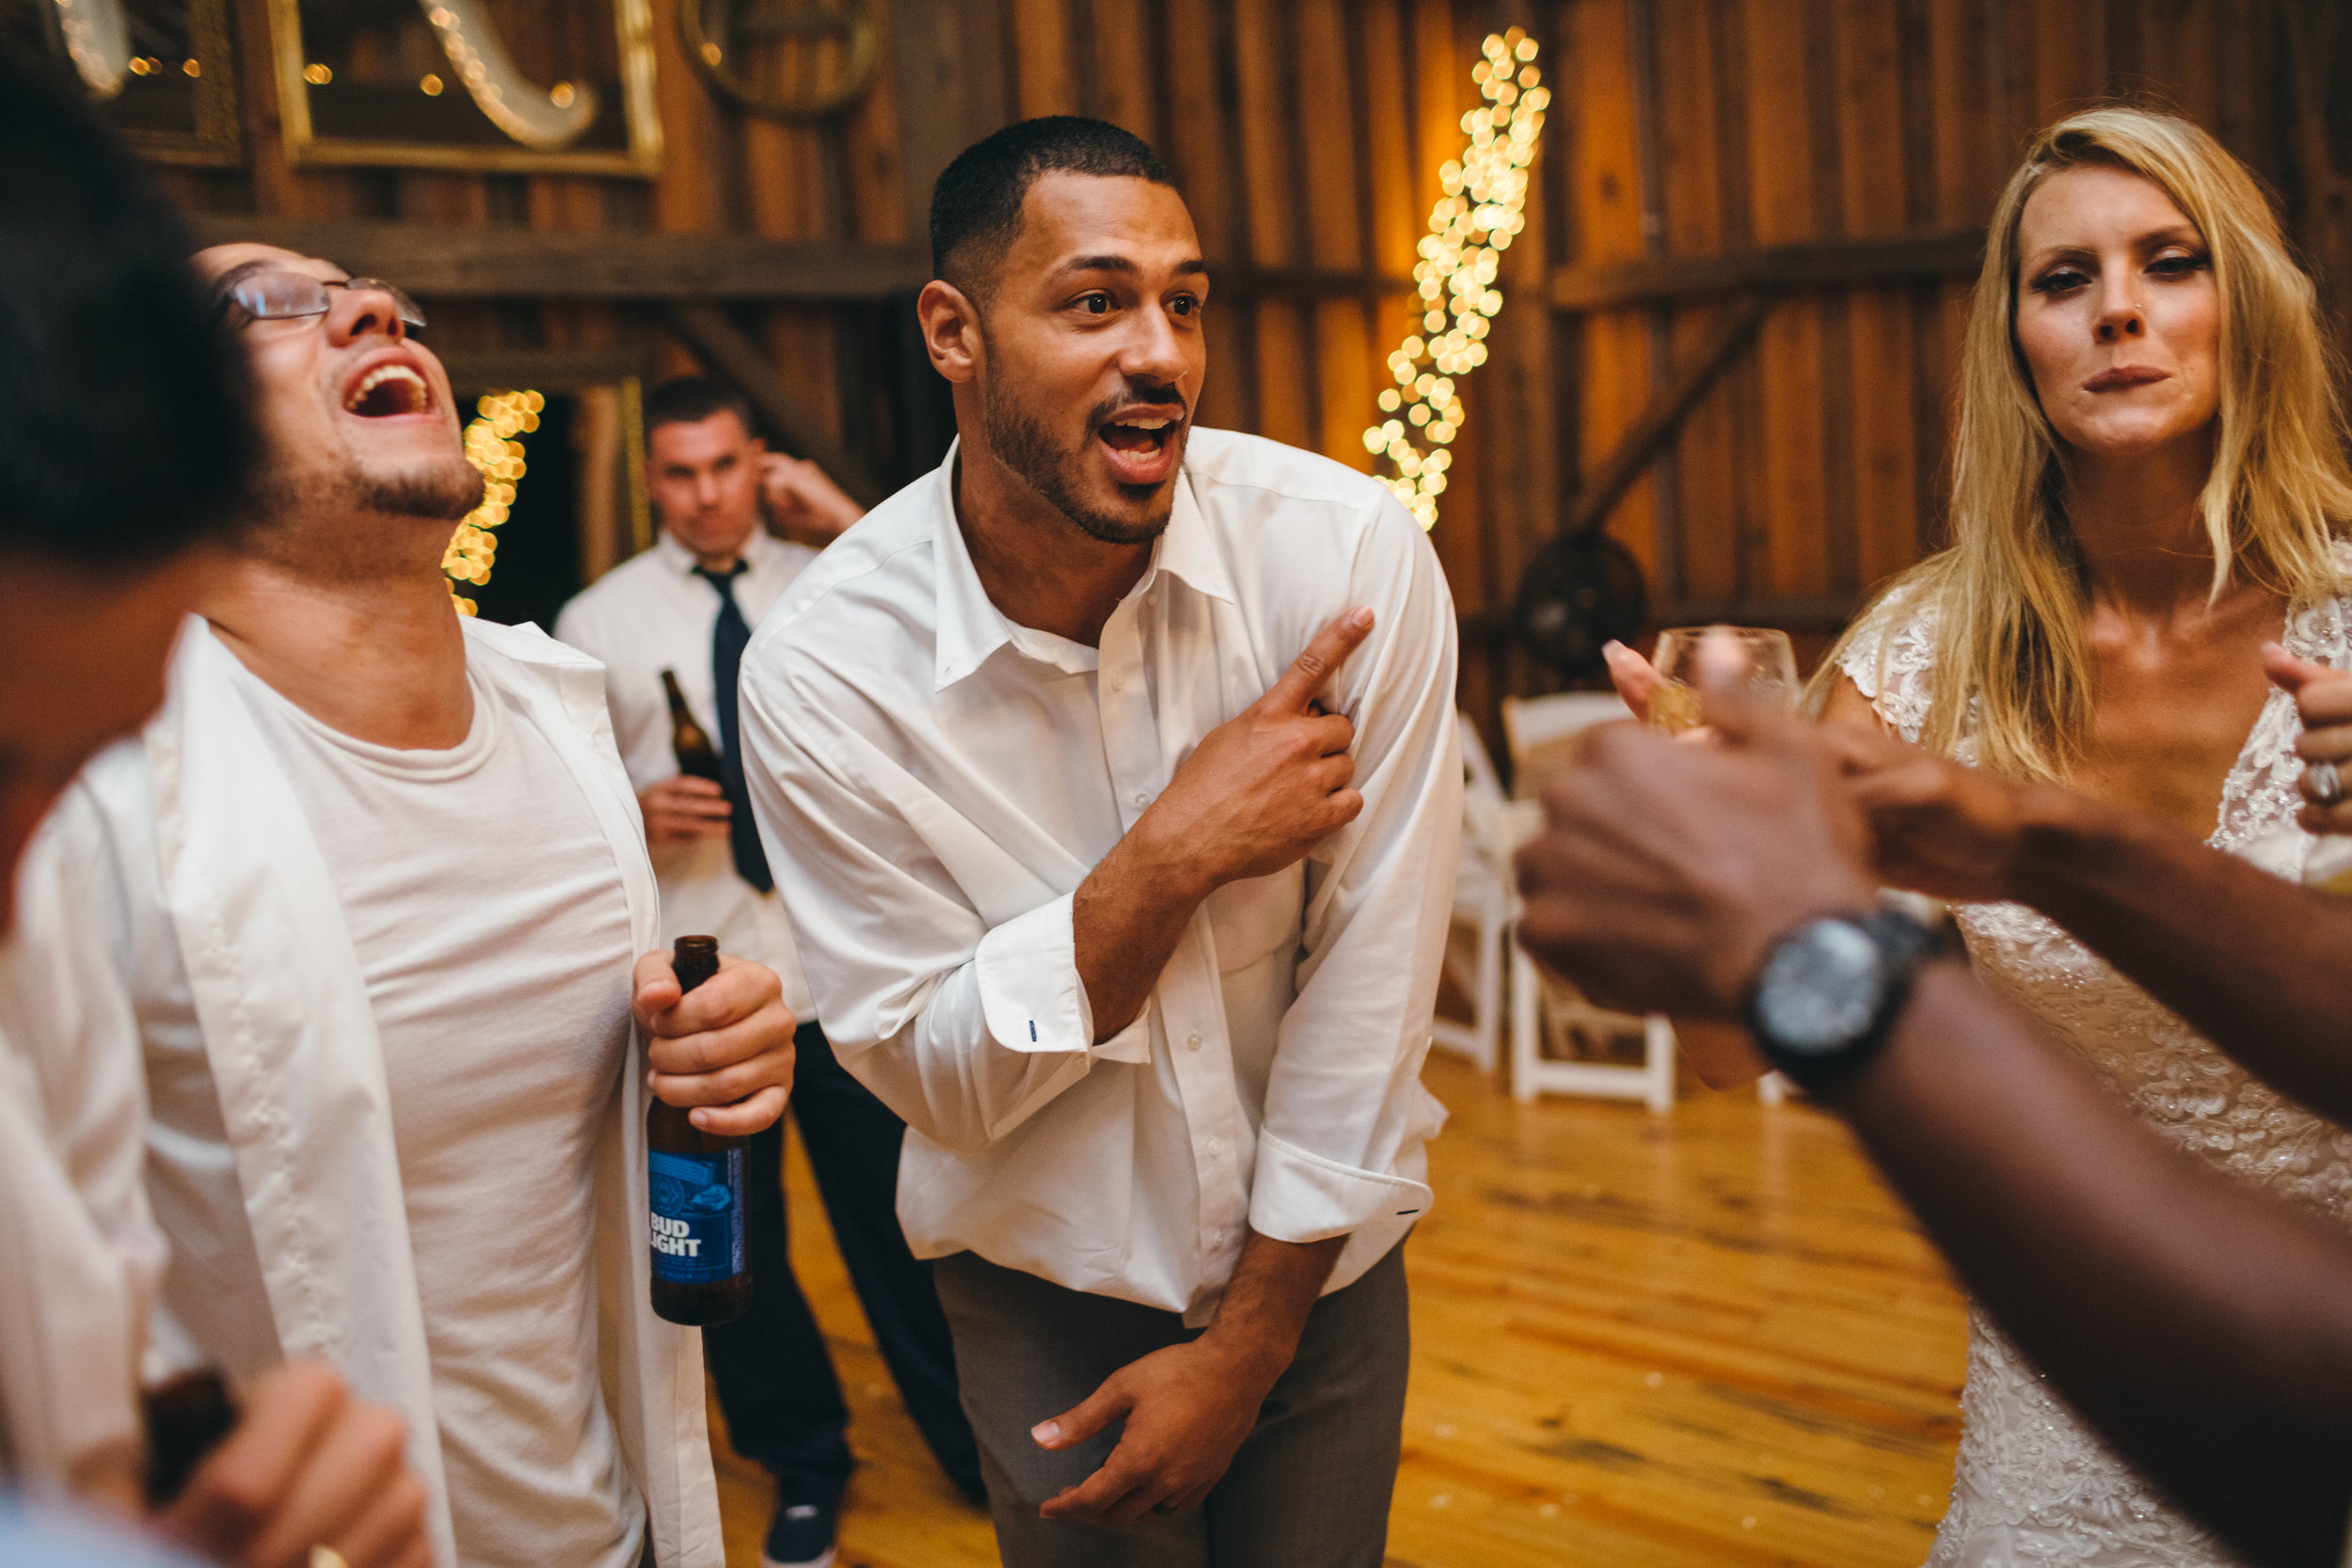 Lynchburg Wedding Photographer; Lynchburg Photographer; Lynchburg Wedding; Sorella Farms Wedding; Virginia Wedding Photographer; Virginia Wedding-33.jpg